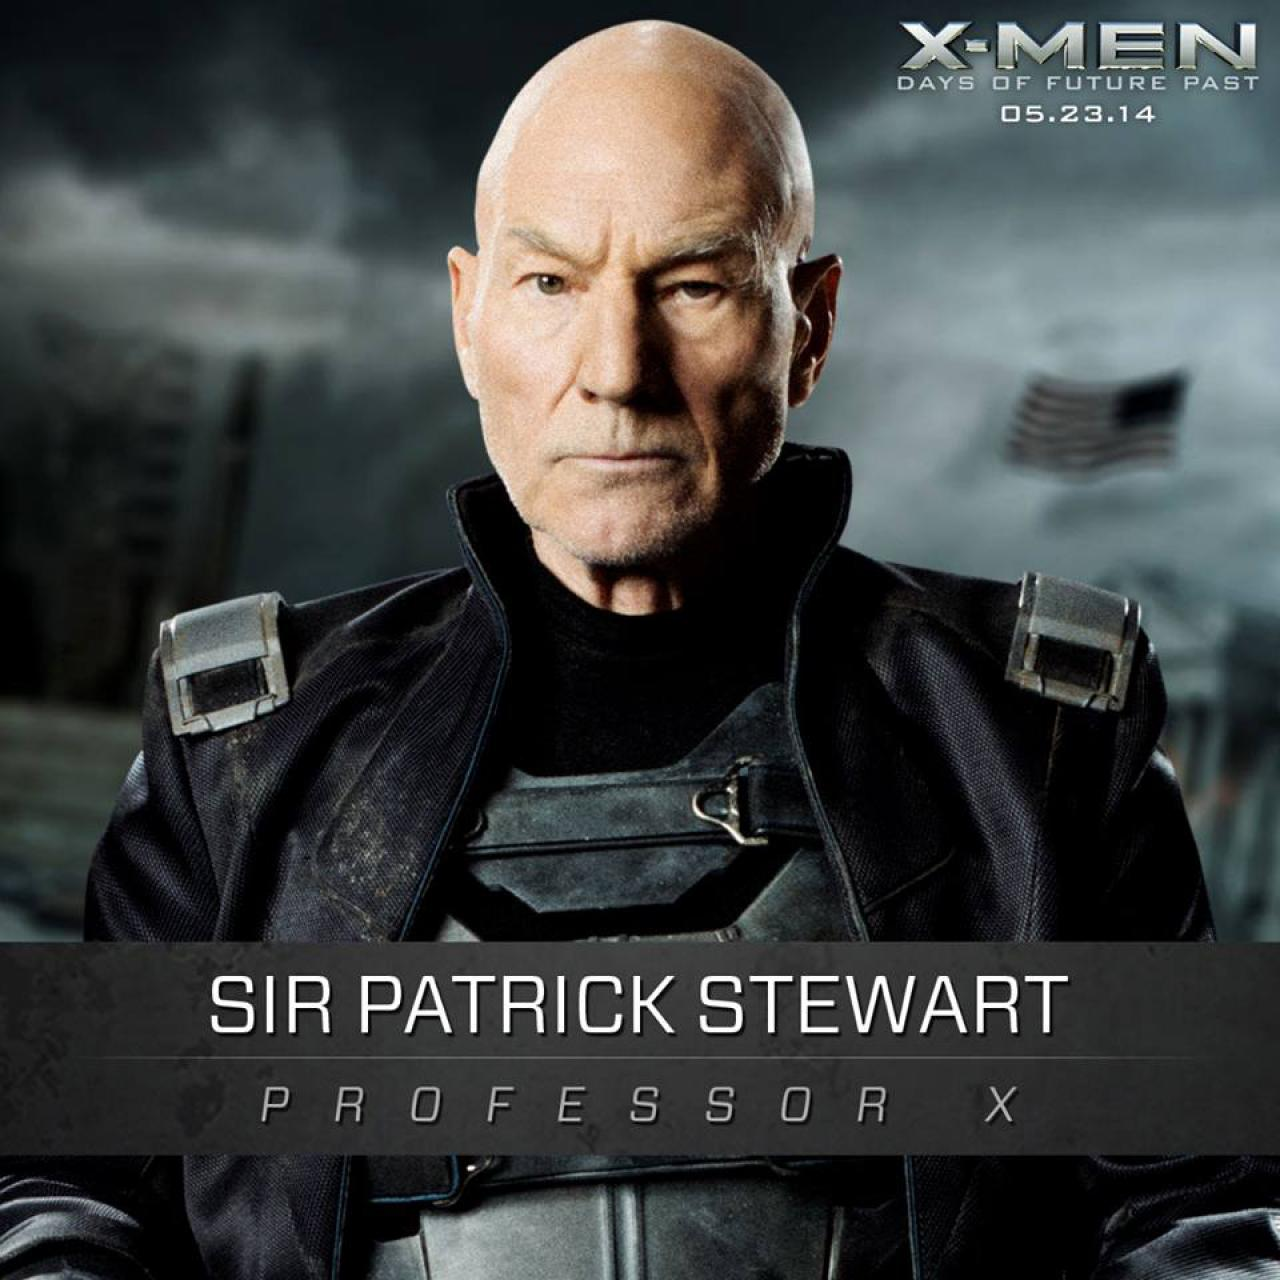 X-Men-_Days_of_Future_Past_86.jpg